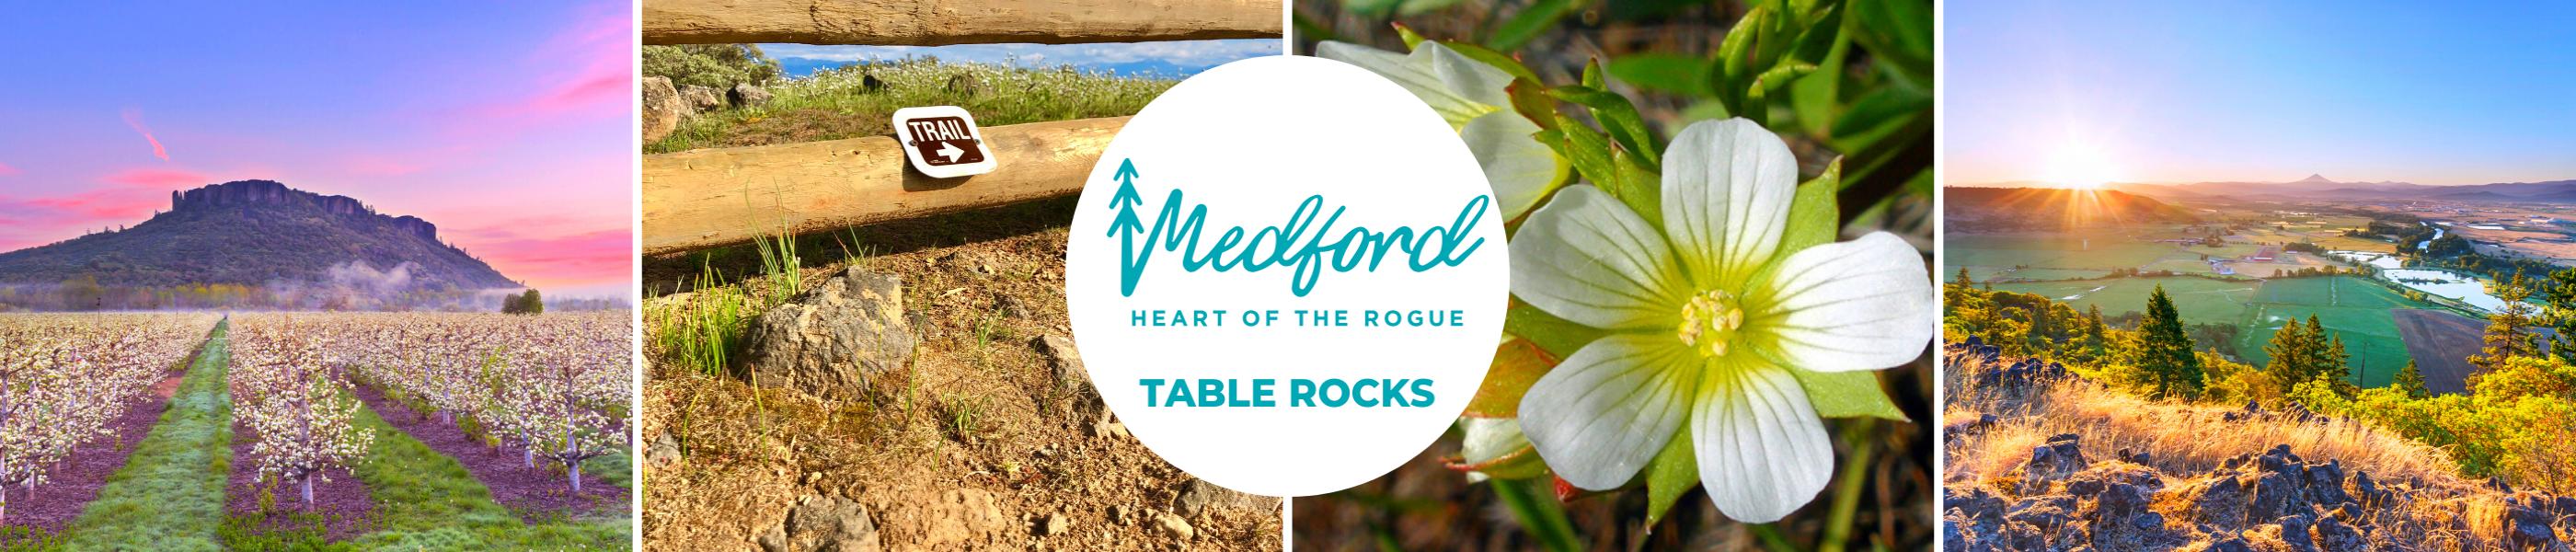 Table Rocks